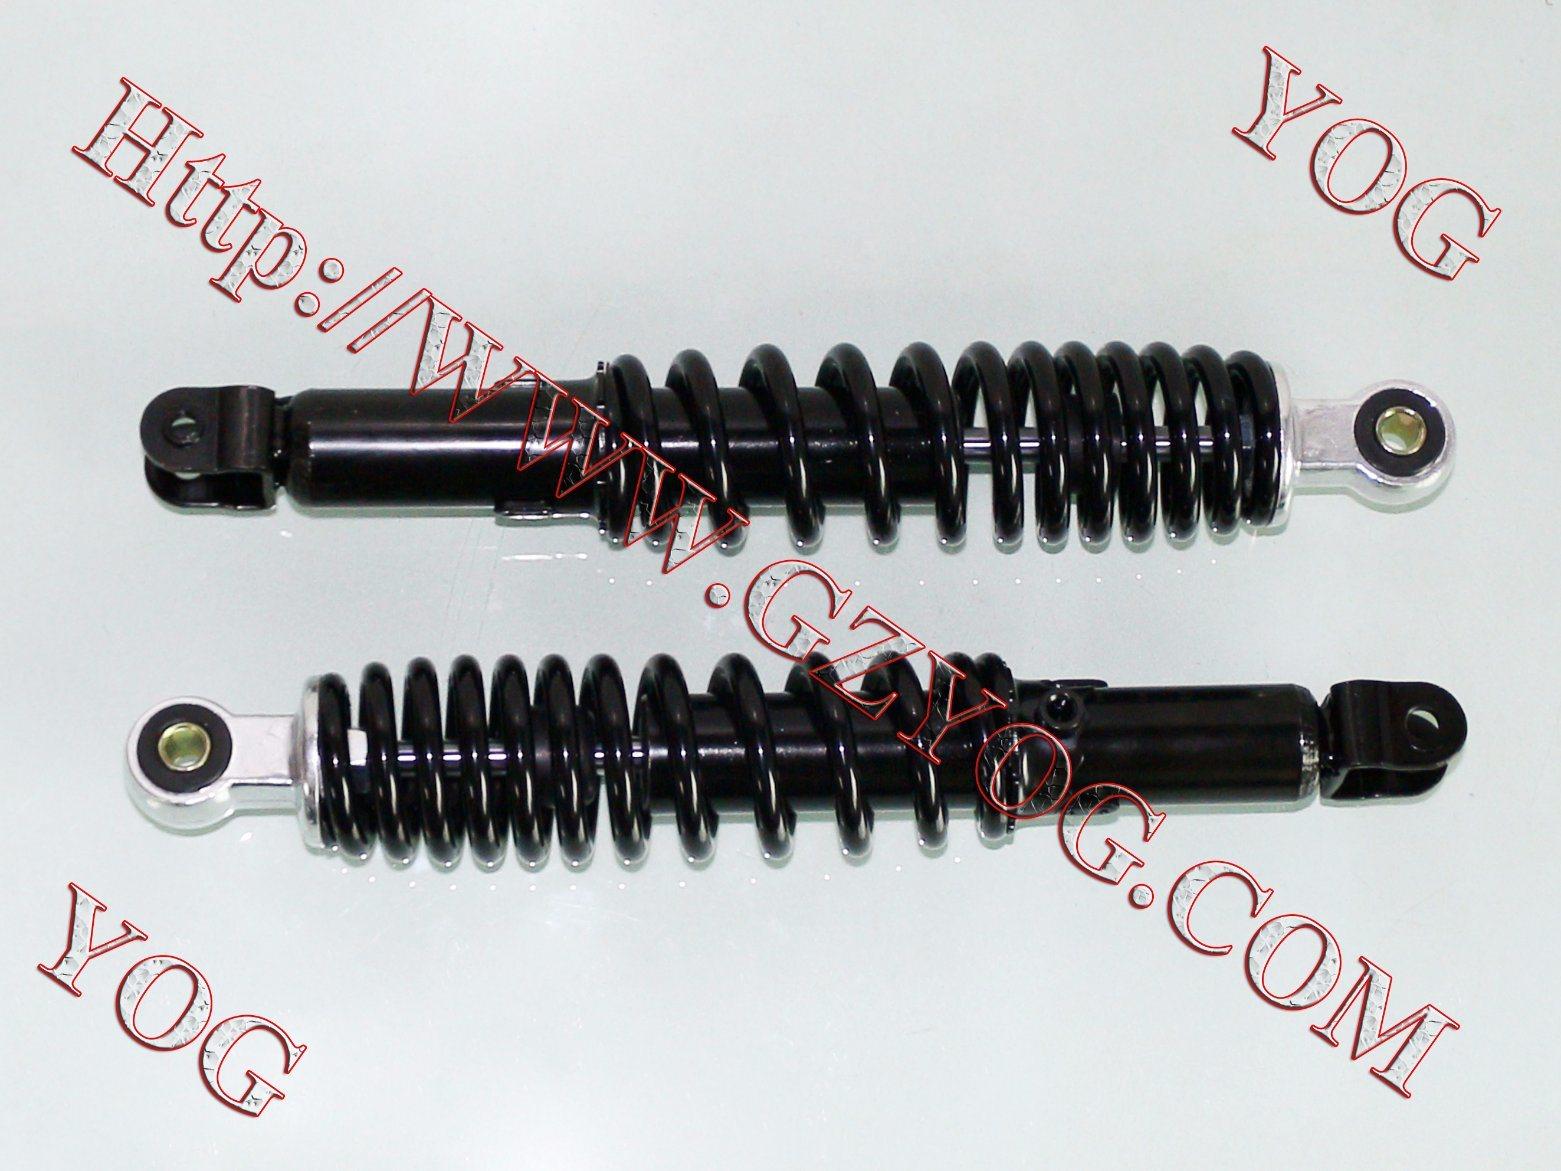 China Yog Motorcycle Parts Rear Shock Absorber For Nxr 125 Bross Ninja Lj125 Kaze Lf150